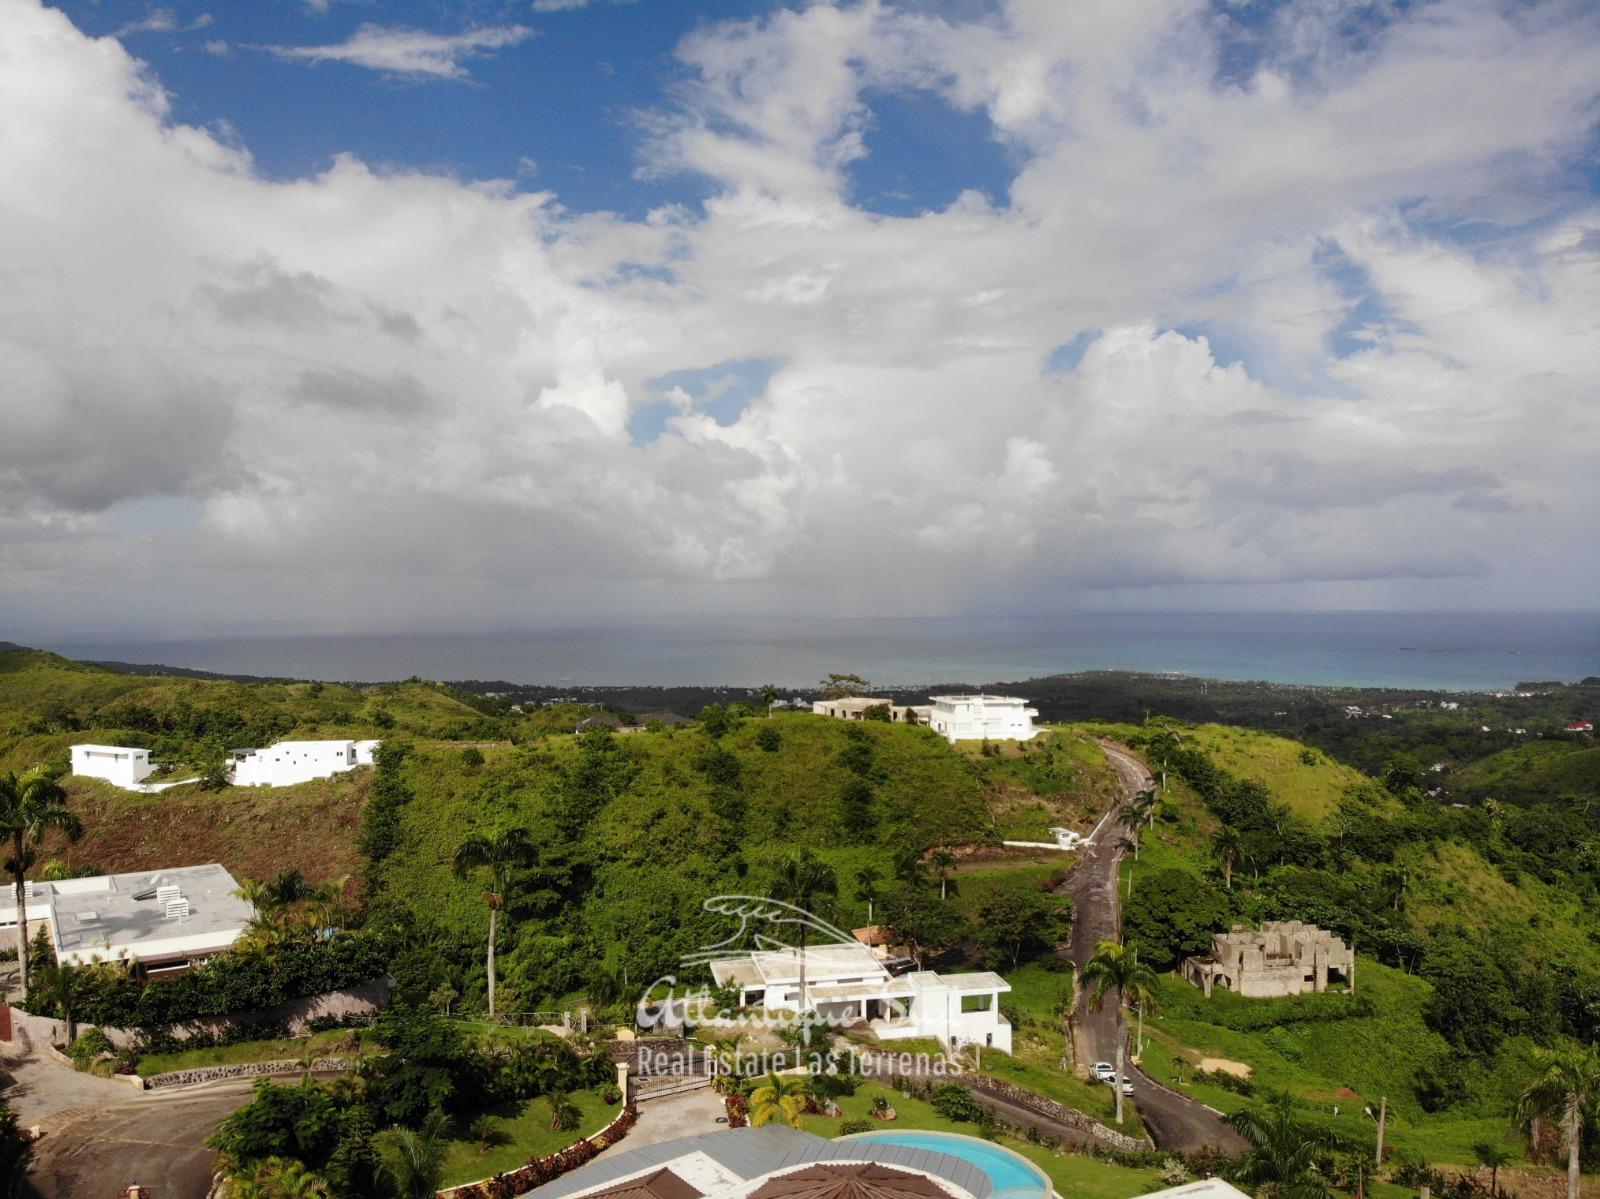 Hillside Lots for sale in Las Terrenas1.jpeg